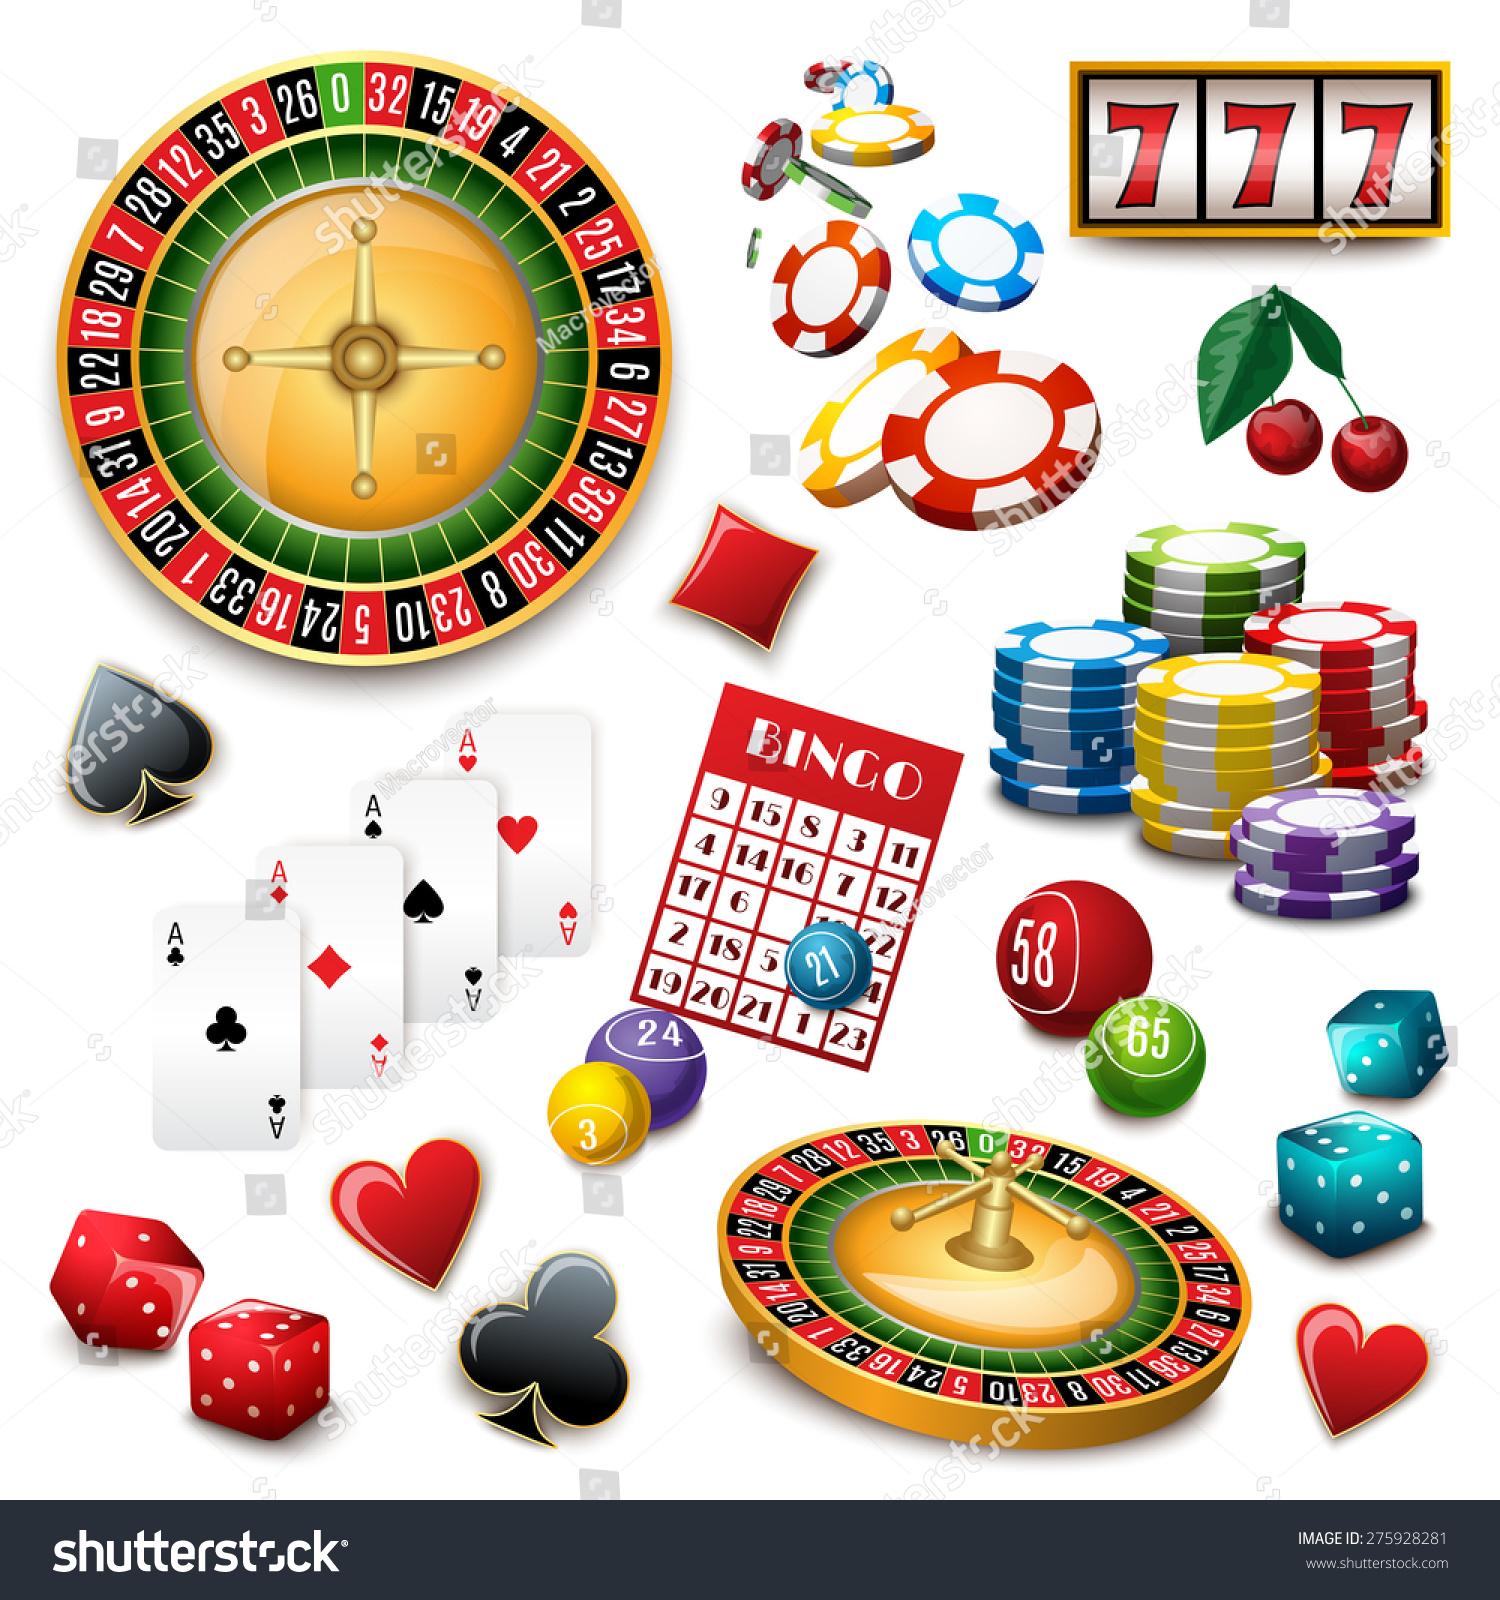 Casino online popular winward casino no deposit bonus 2012